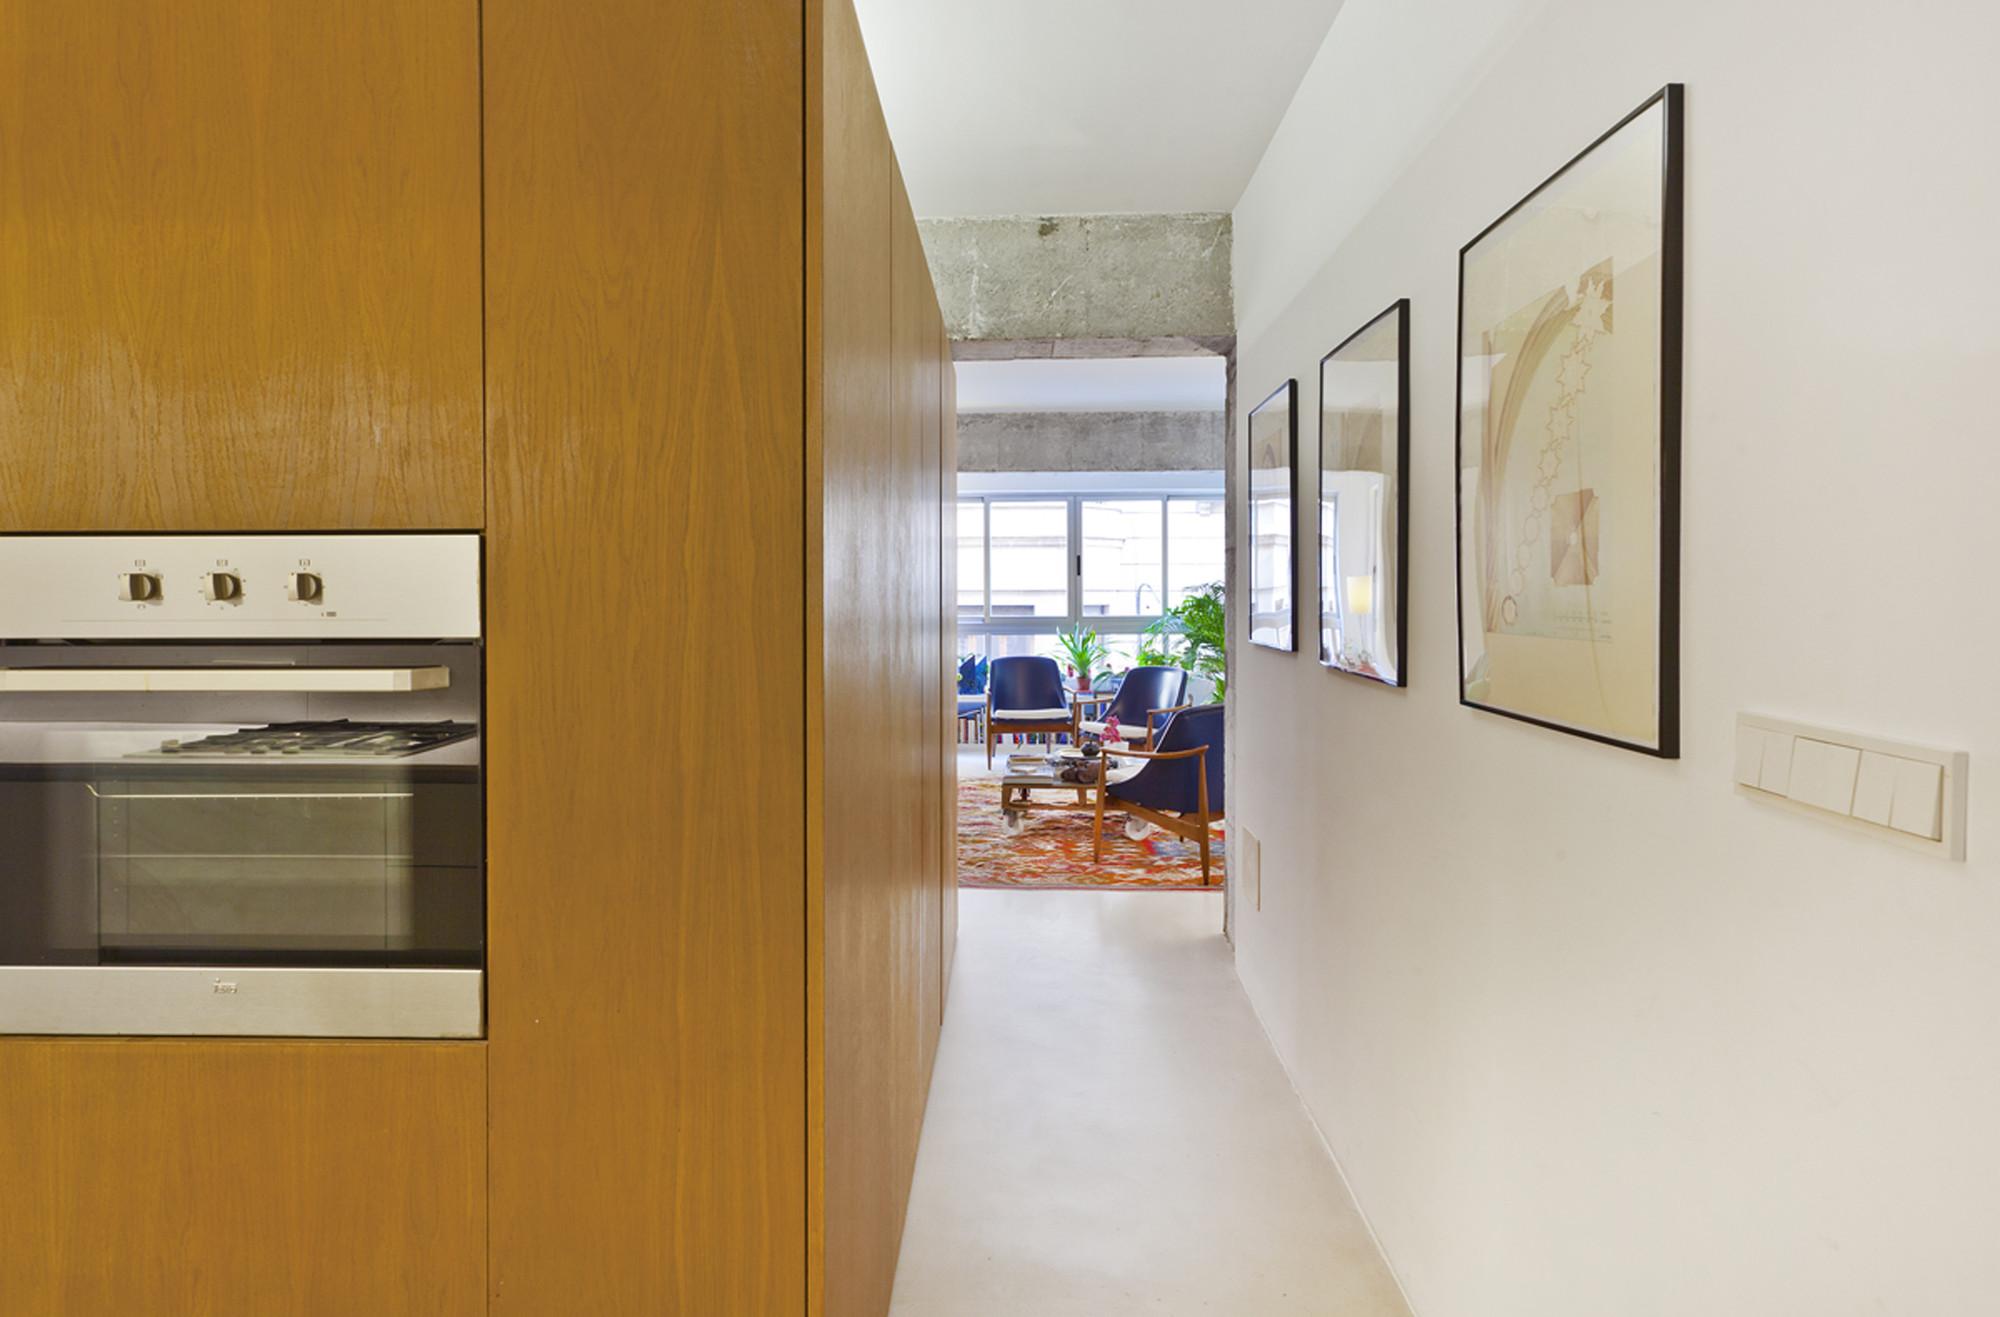 Galeria de reforma de apartamento em palma de mallorca vila segui arquitectos 2 - Arquitectos palma de mallorca ...